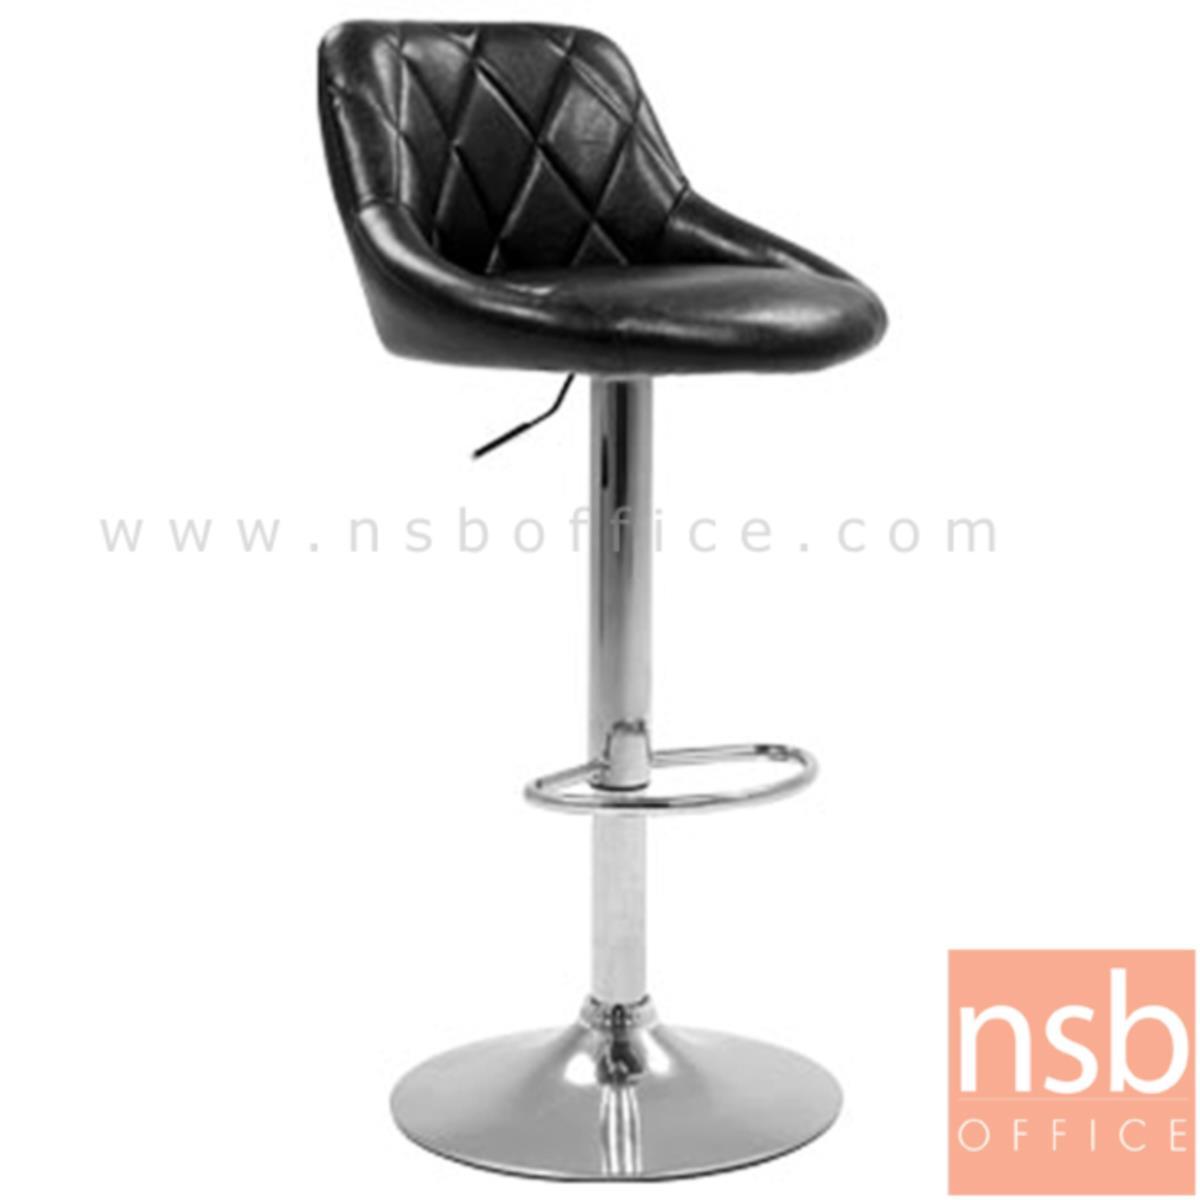 B18A026:เก้าอี้บาร์สูงหนัง PU BY-CAST รุ่น BHS-1671 ขนาด 51W cm. โช๊คแก๊ส ขาโครเมี่ยมฐานจานกลม